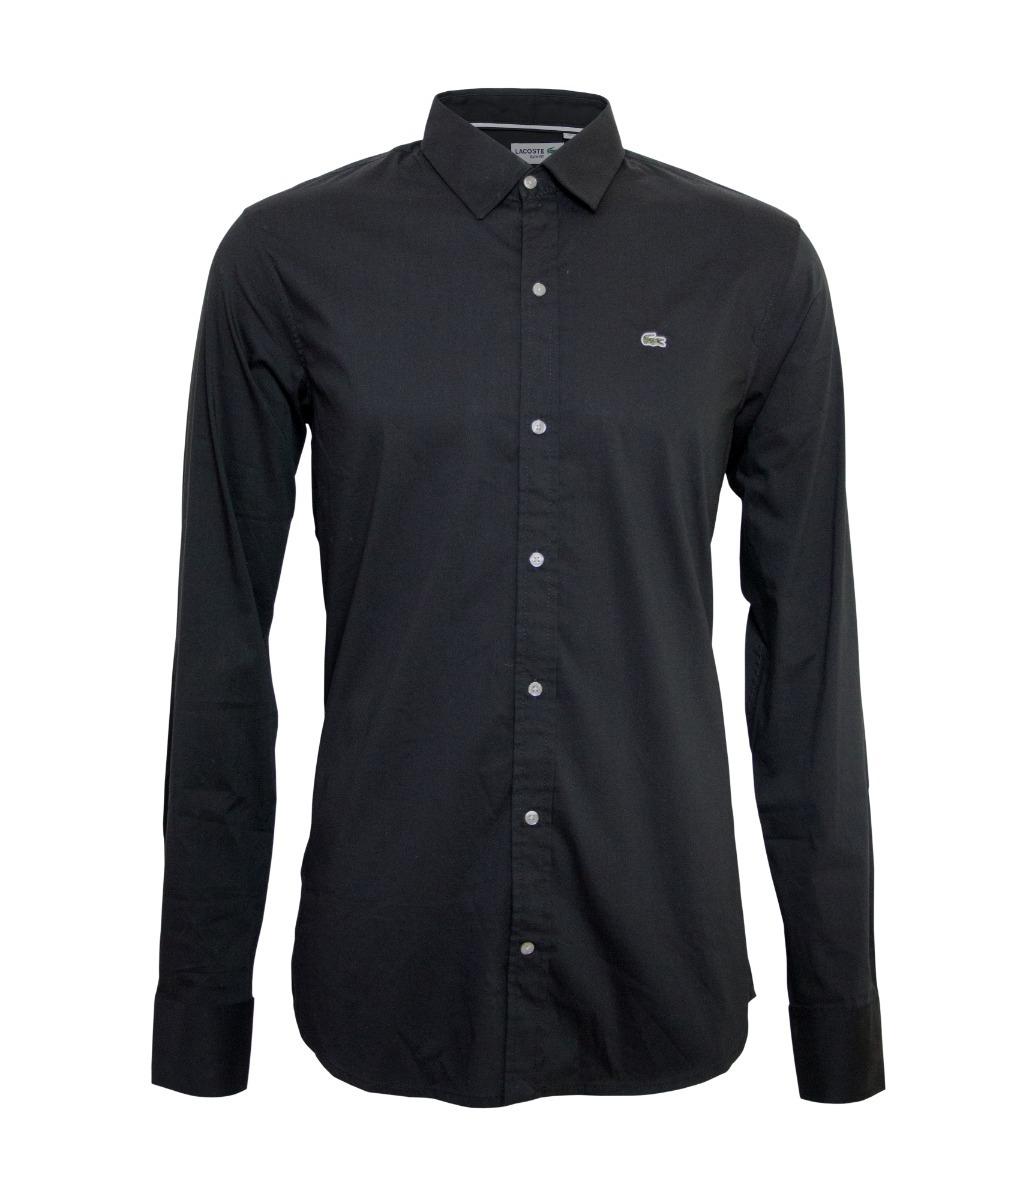 f55894944de91 Camisa Social Lacoste Preta Slim Fit Manga Longa - R  287,00 em ...